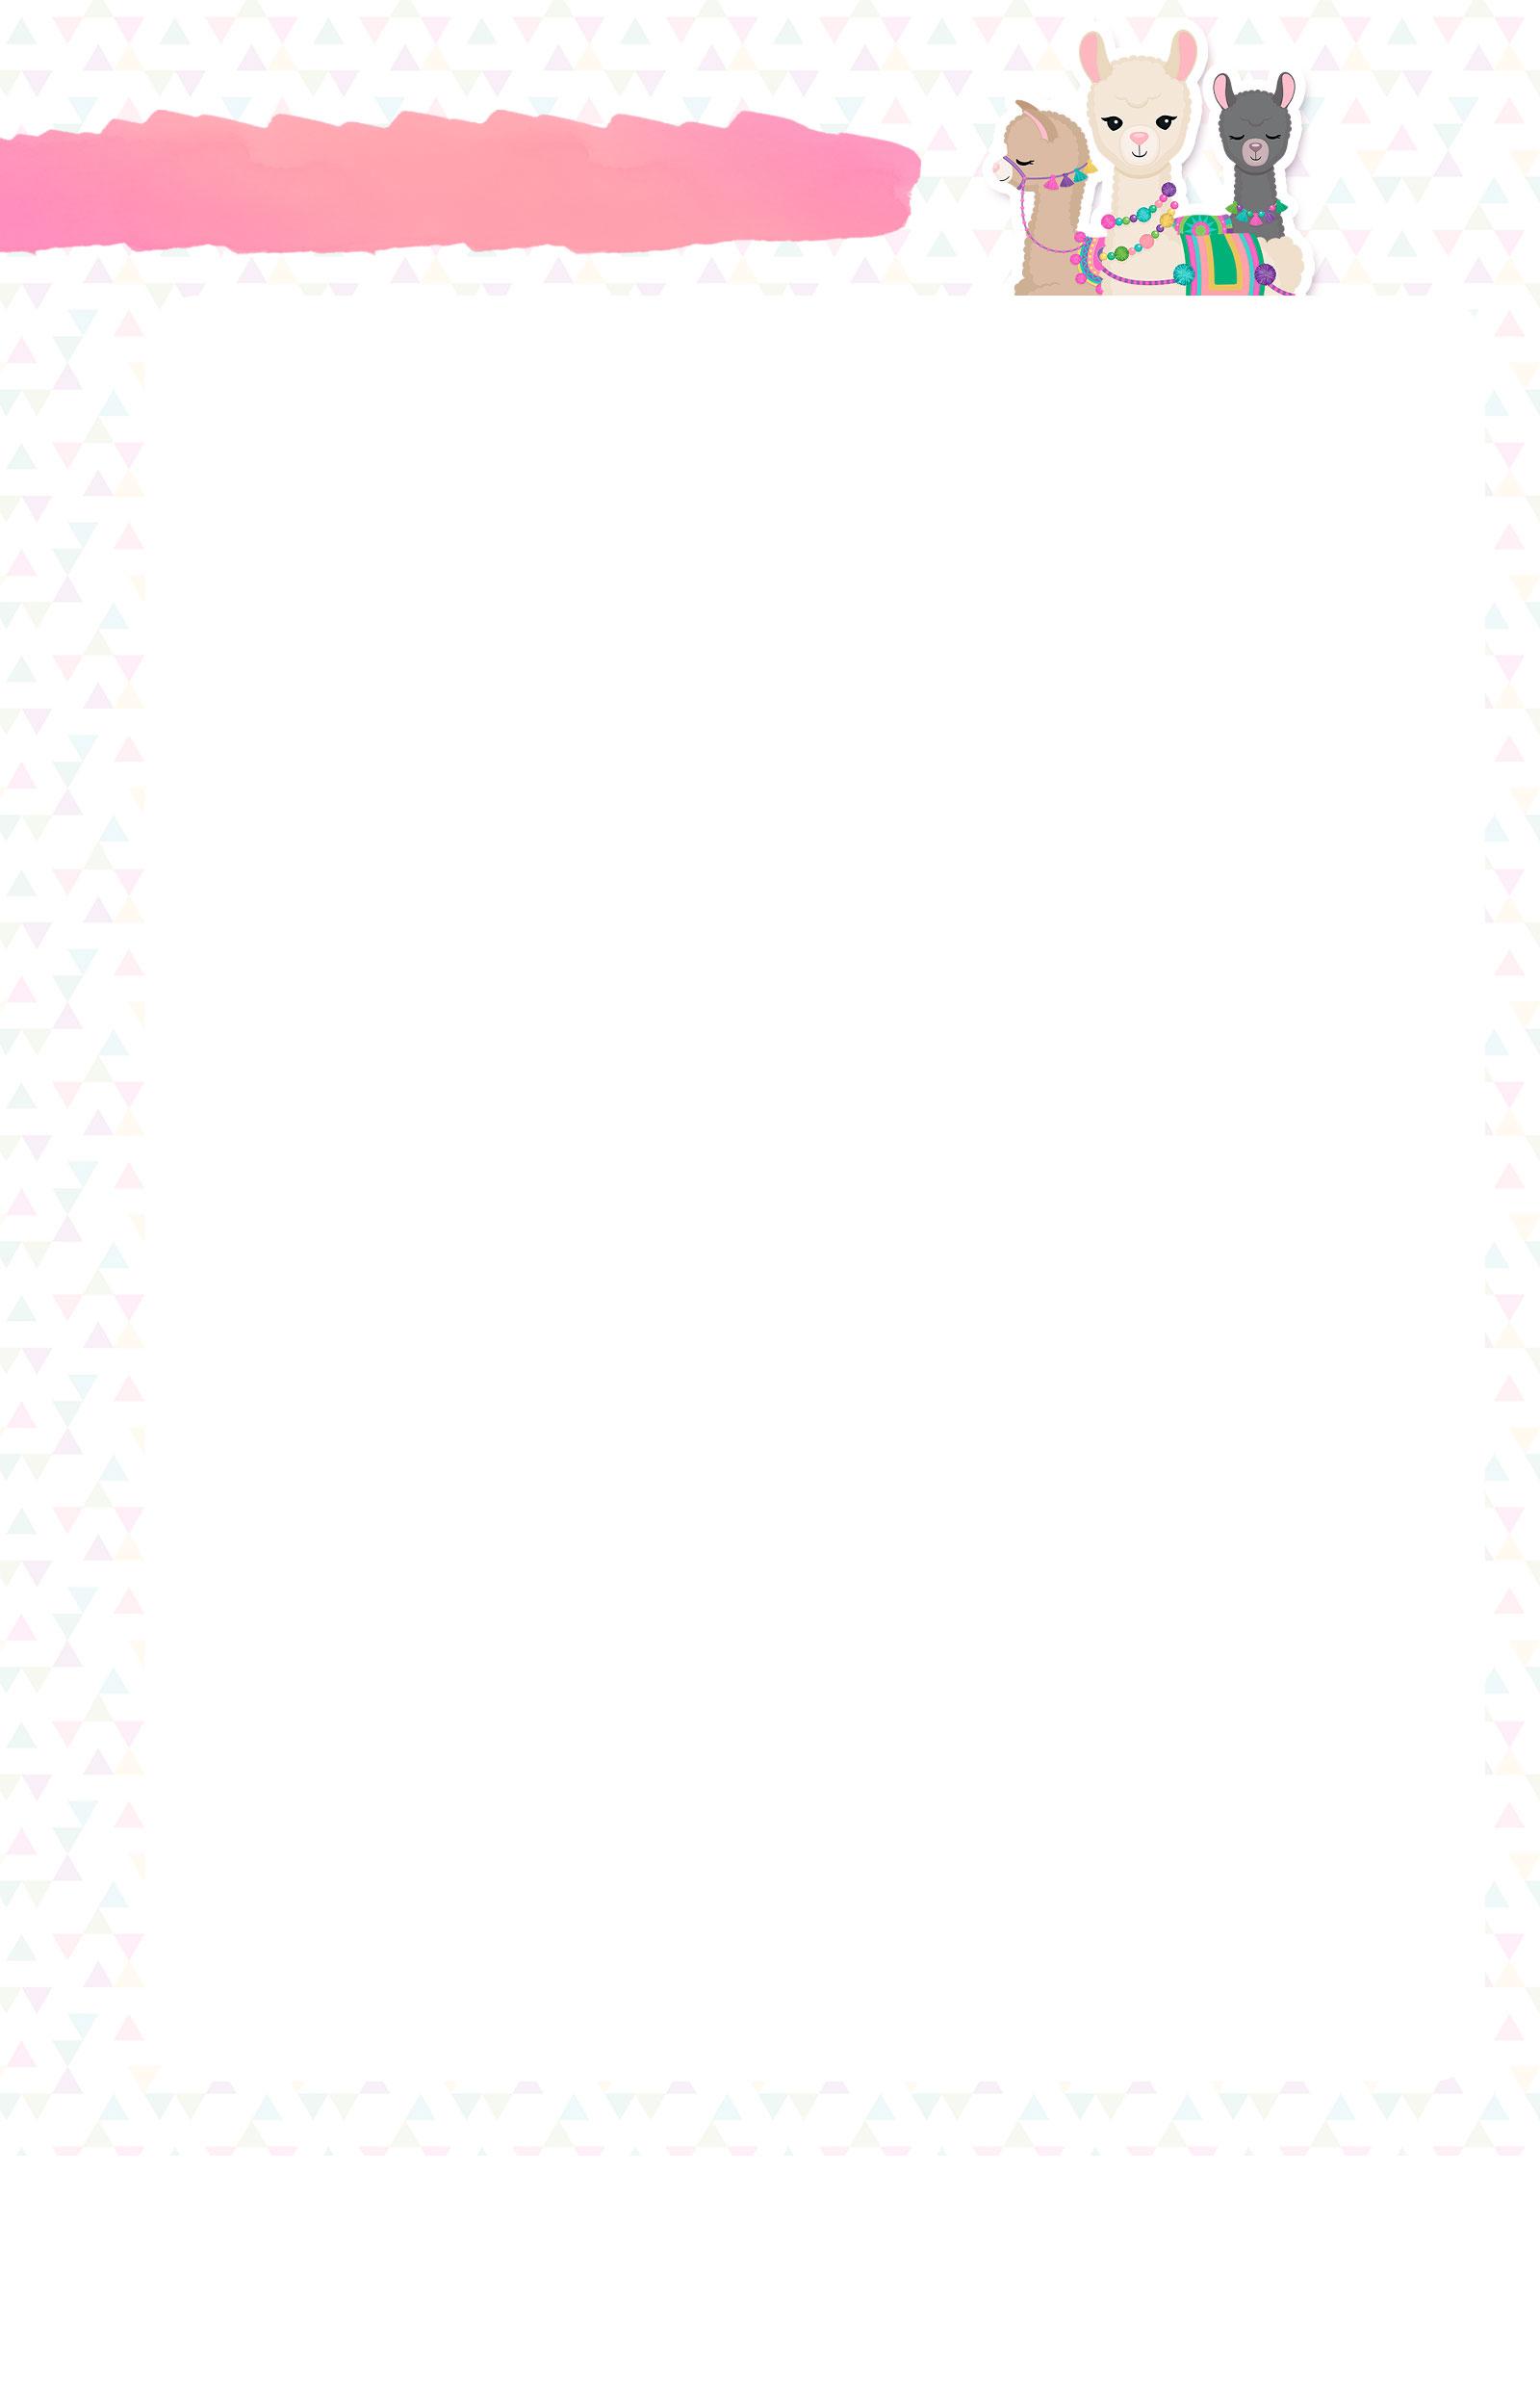 Planner Lhama Rosa 2020 pagina livre